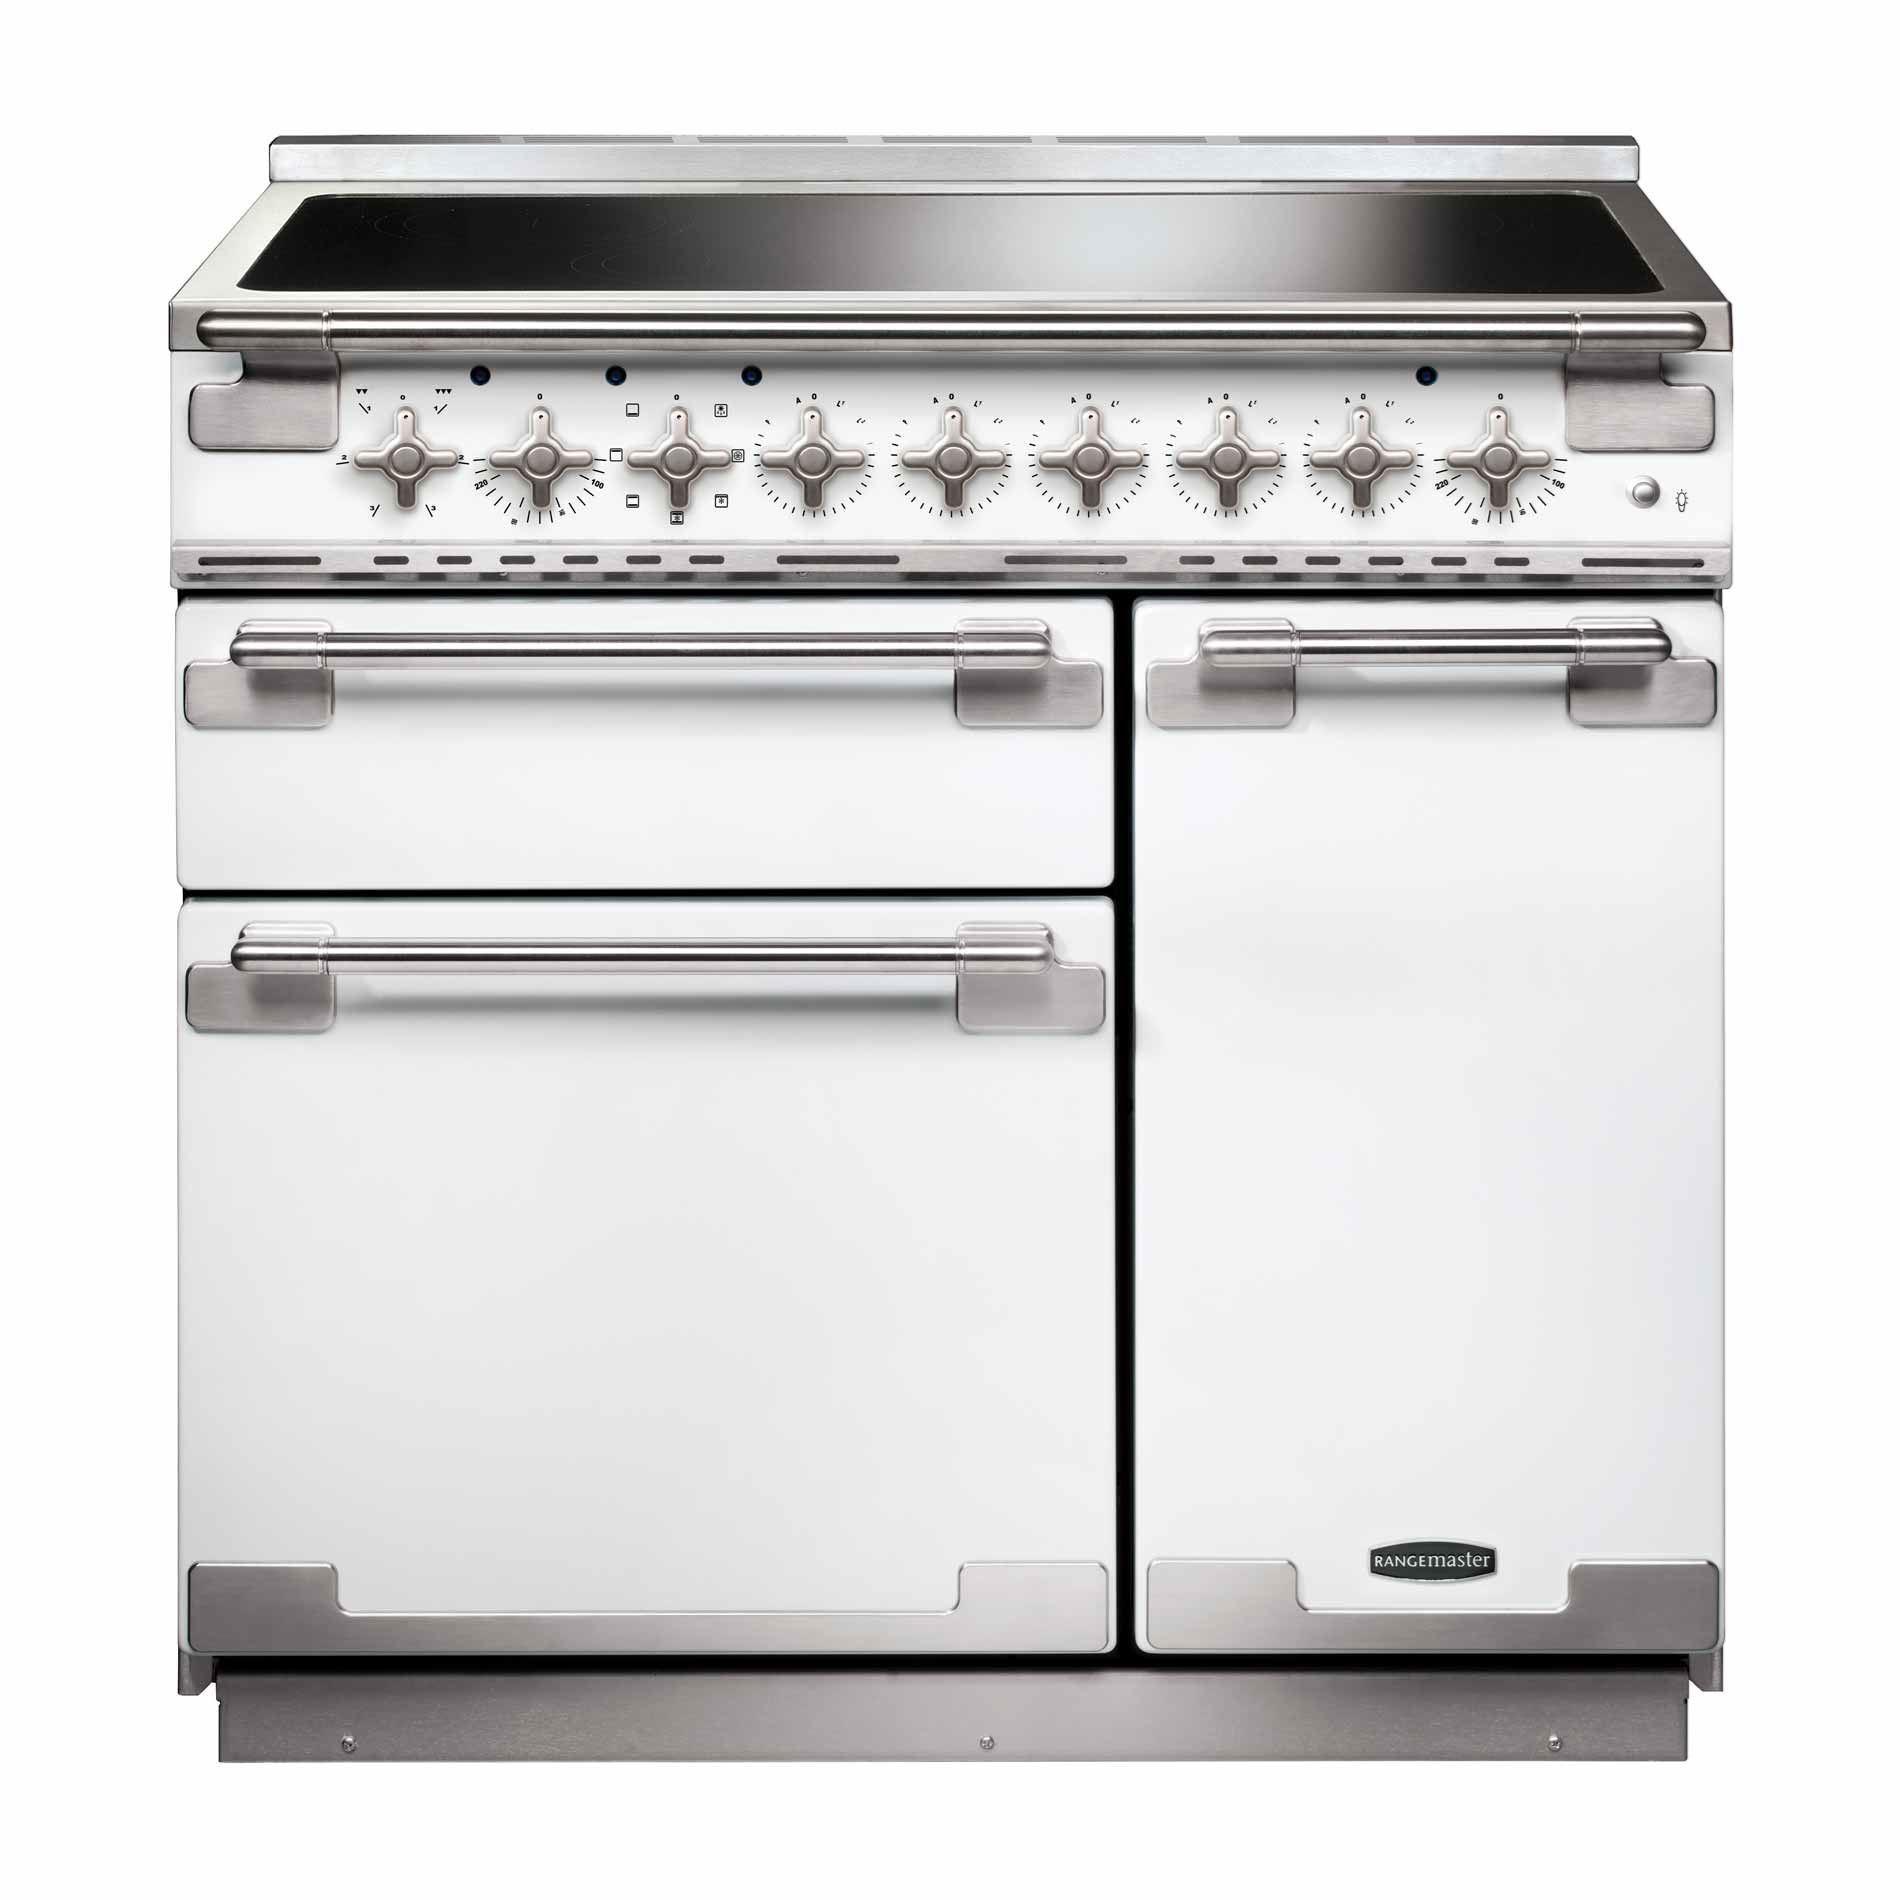 Rangemaster: Elise 90 Induction White Range Cooker - Appliance Source